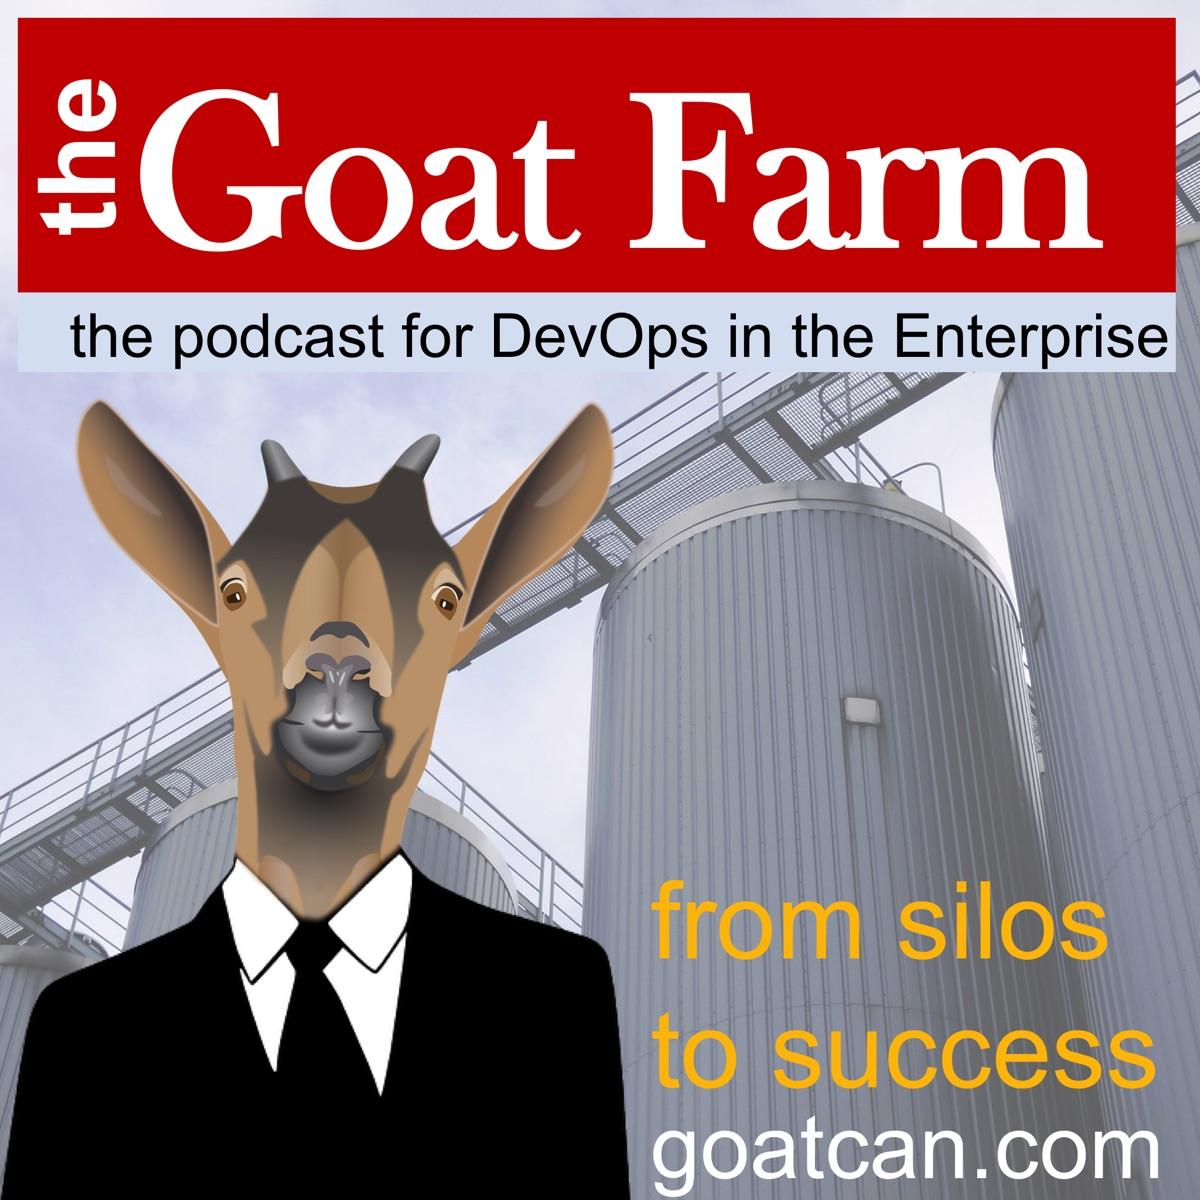 The Goat Farm